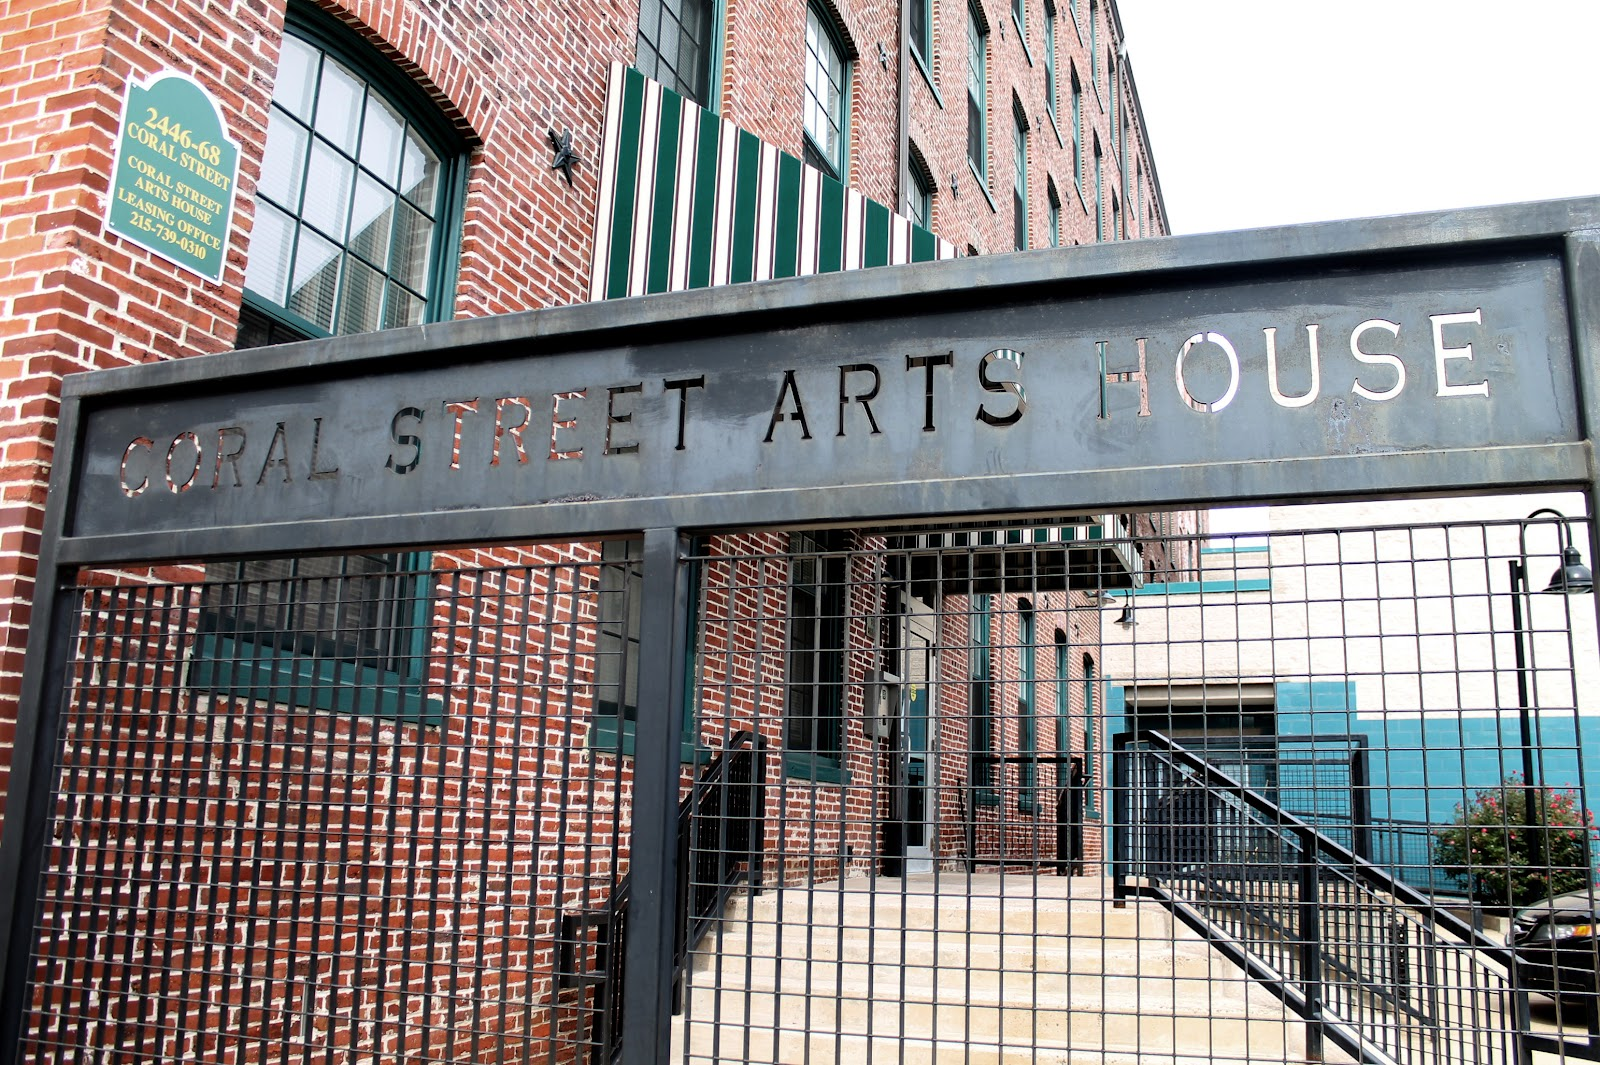 Coral Street Arts House - Kensington